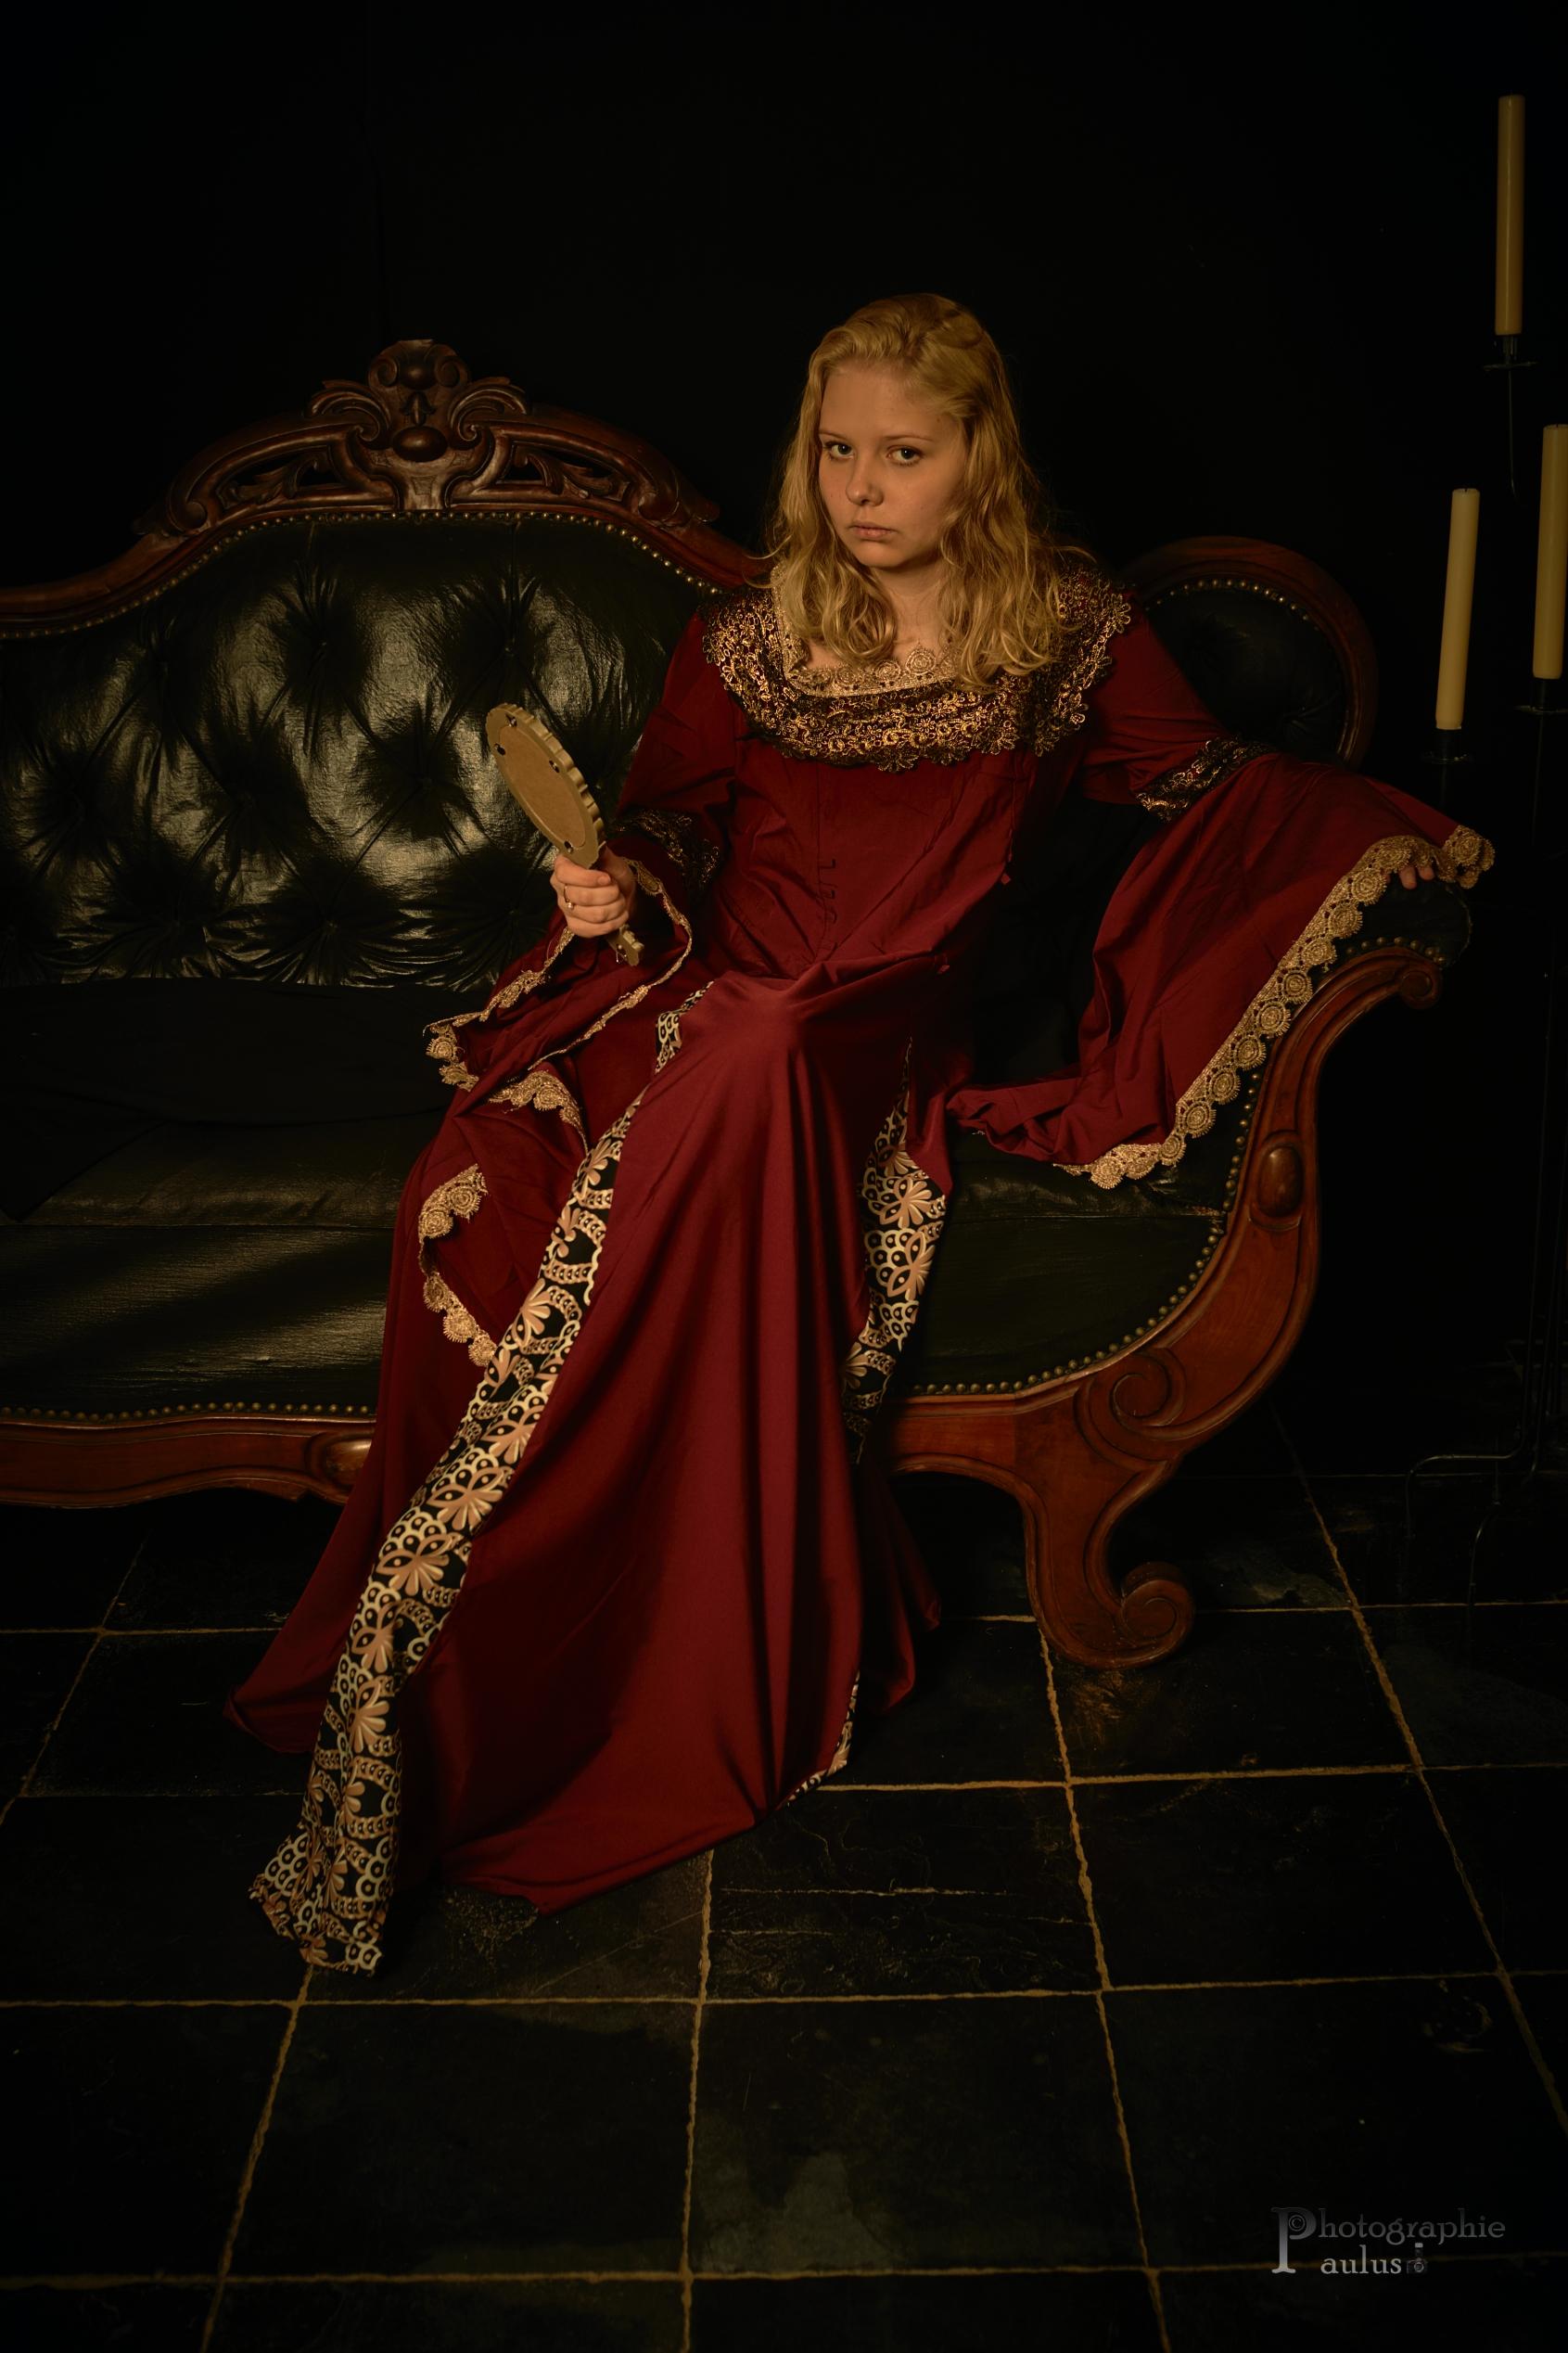 Princesse_Alizée0020